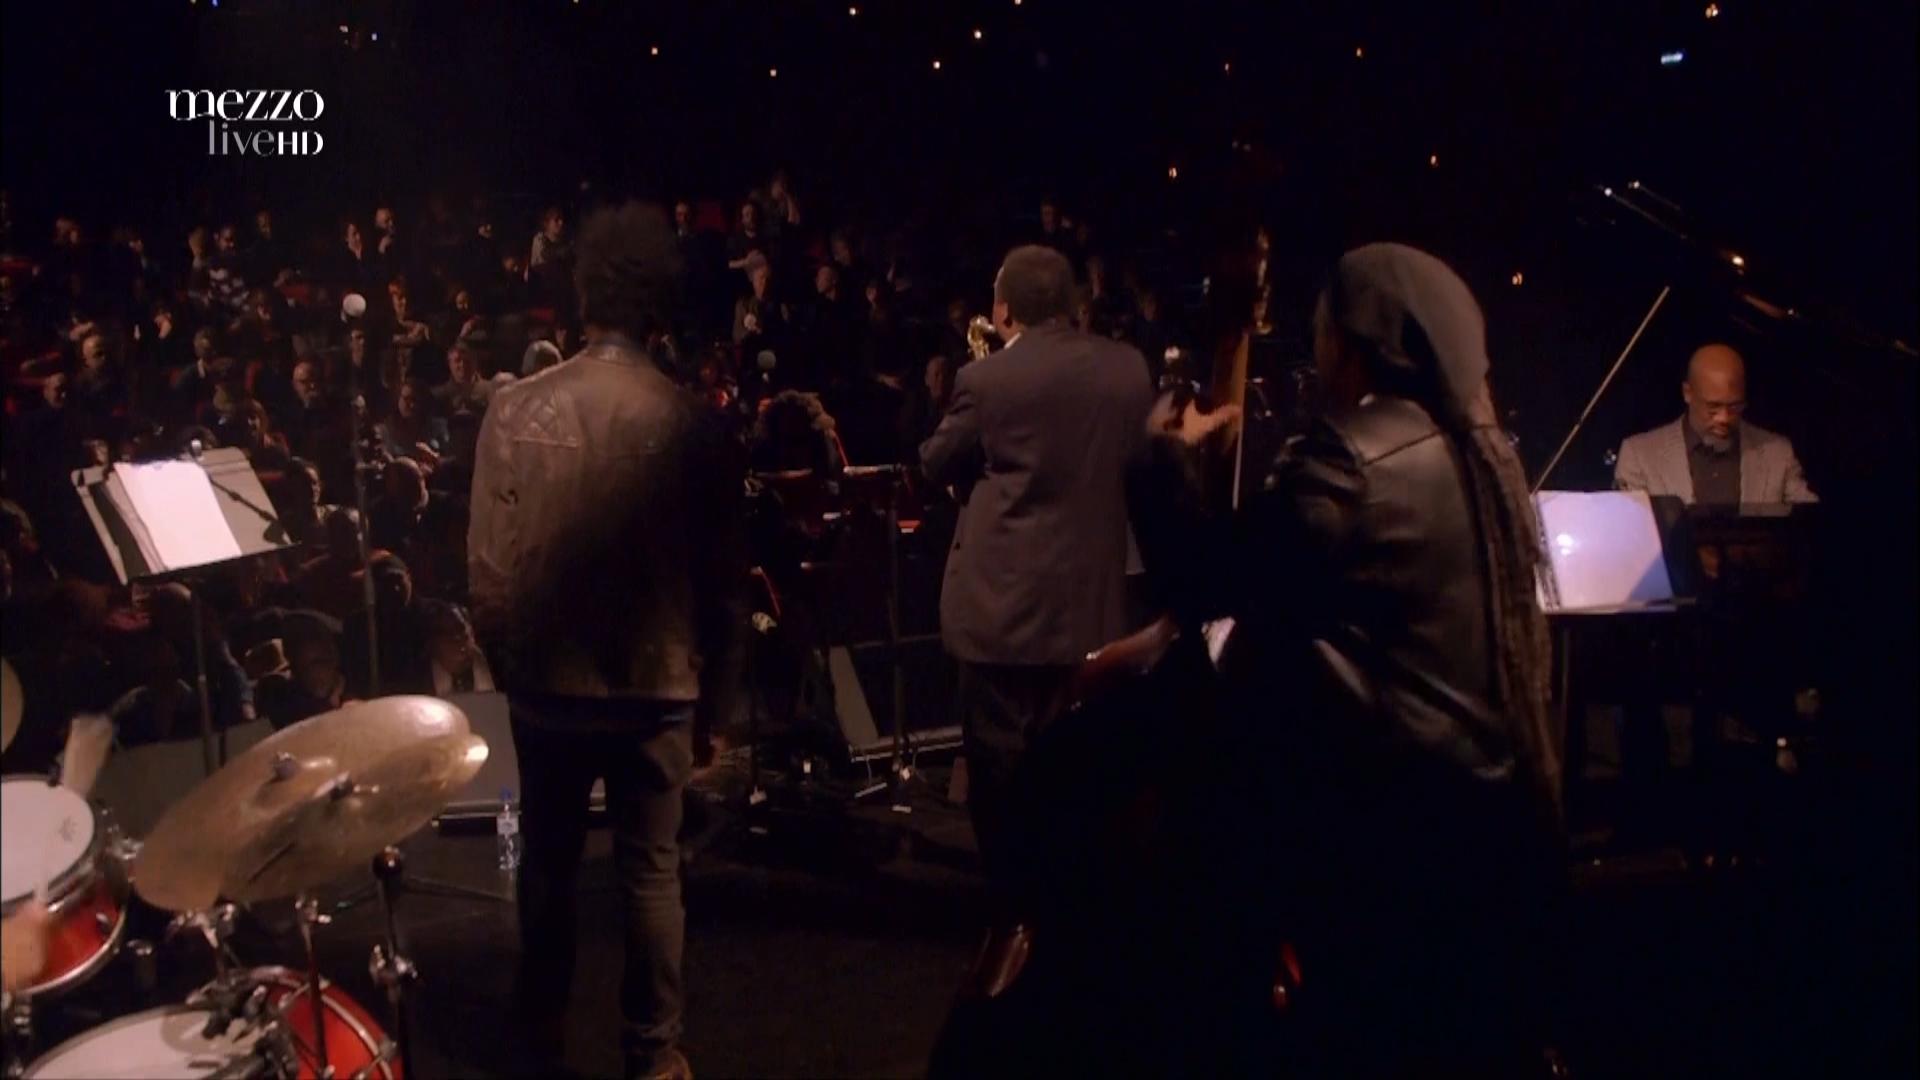 2015 David Murray Infinity Quartet feat. Saul Williams - Disruption at Banlieues Bleues Jazz Fest [HDTV 1080i] 13